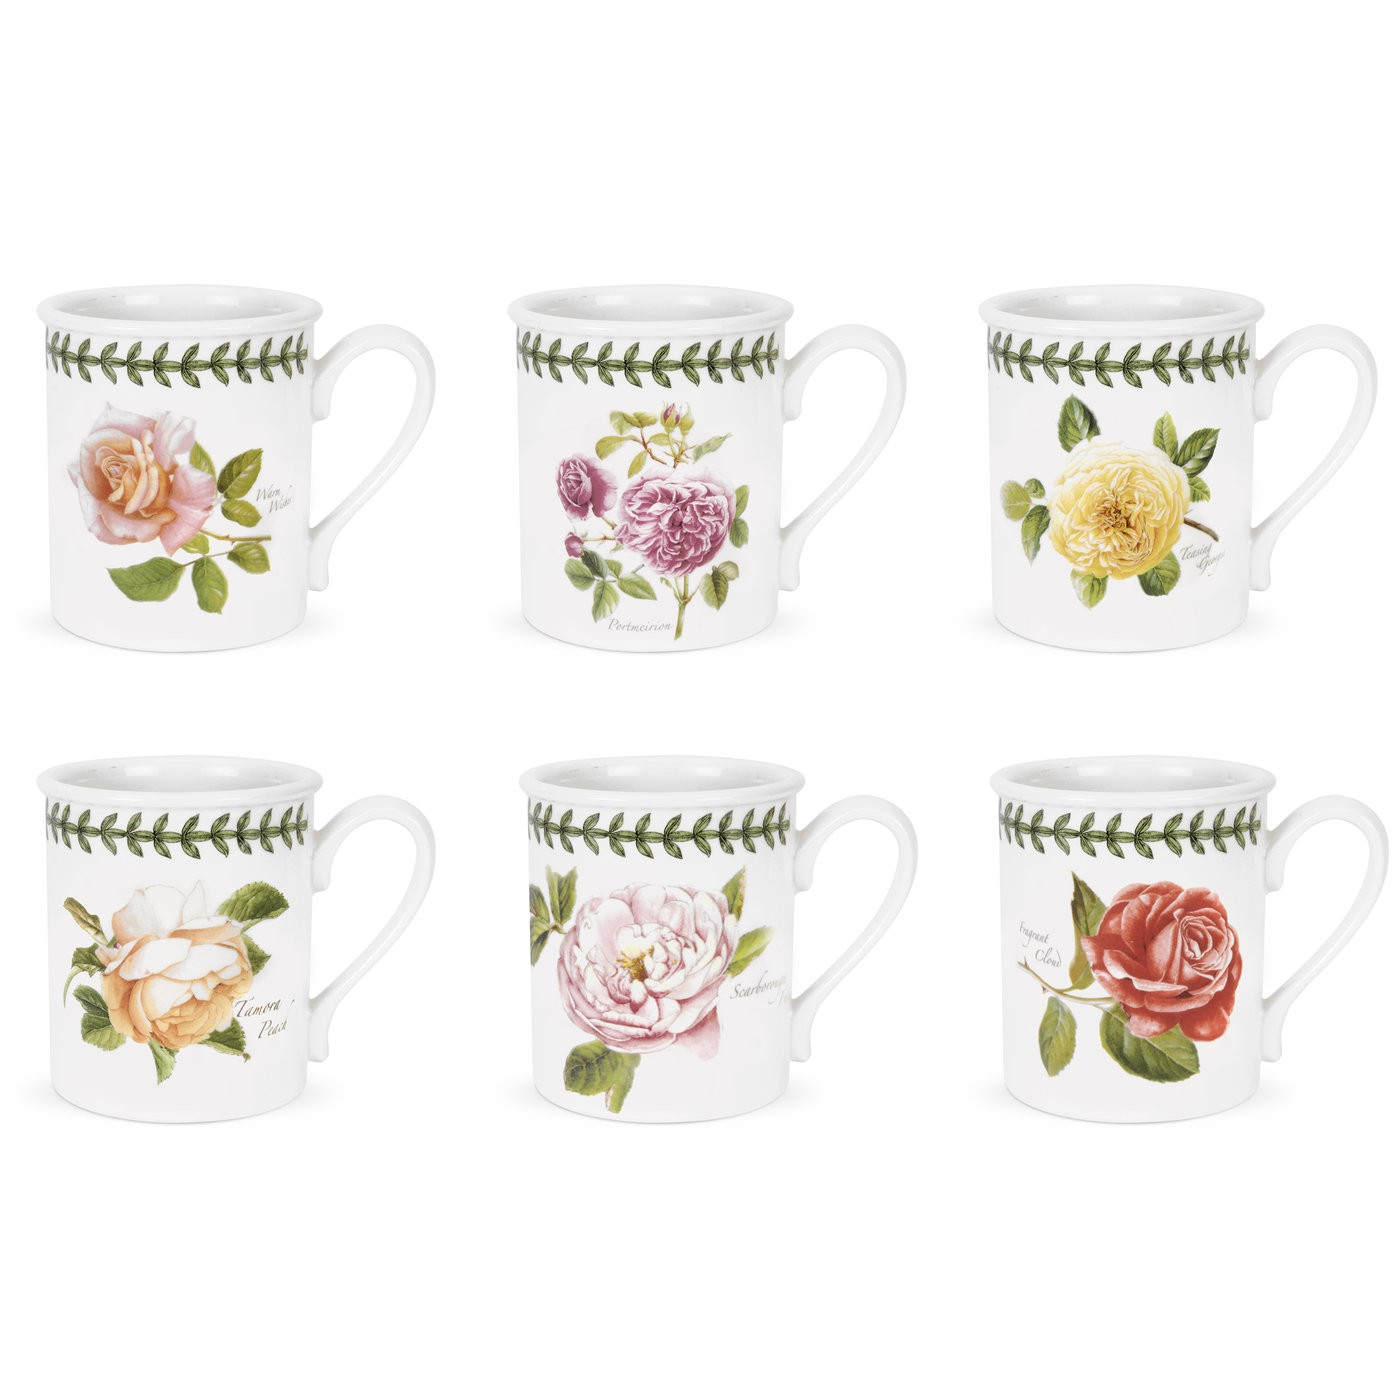 Portmeirion Botanic Roses Breakfast Mug 9oz Set of 6.